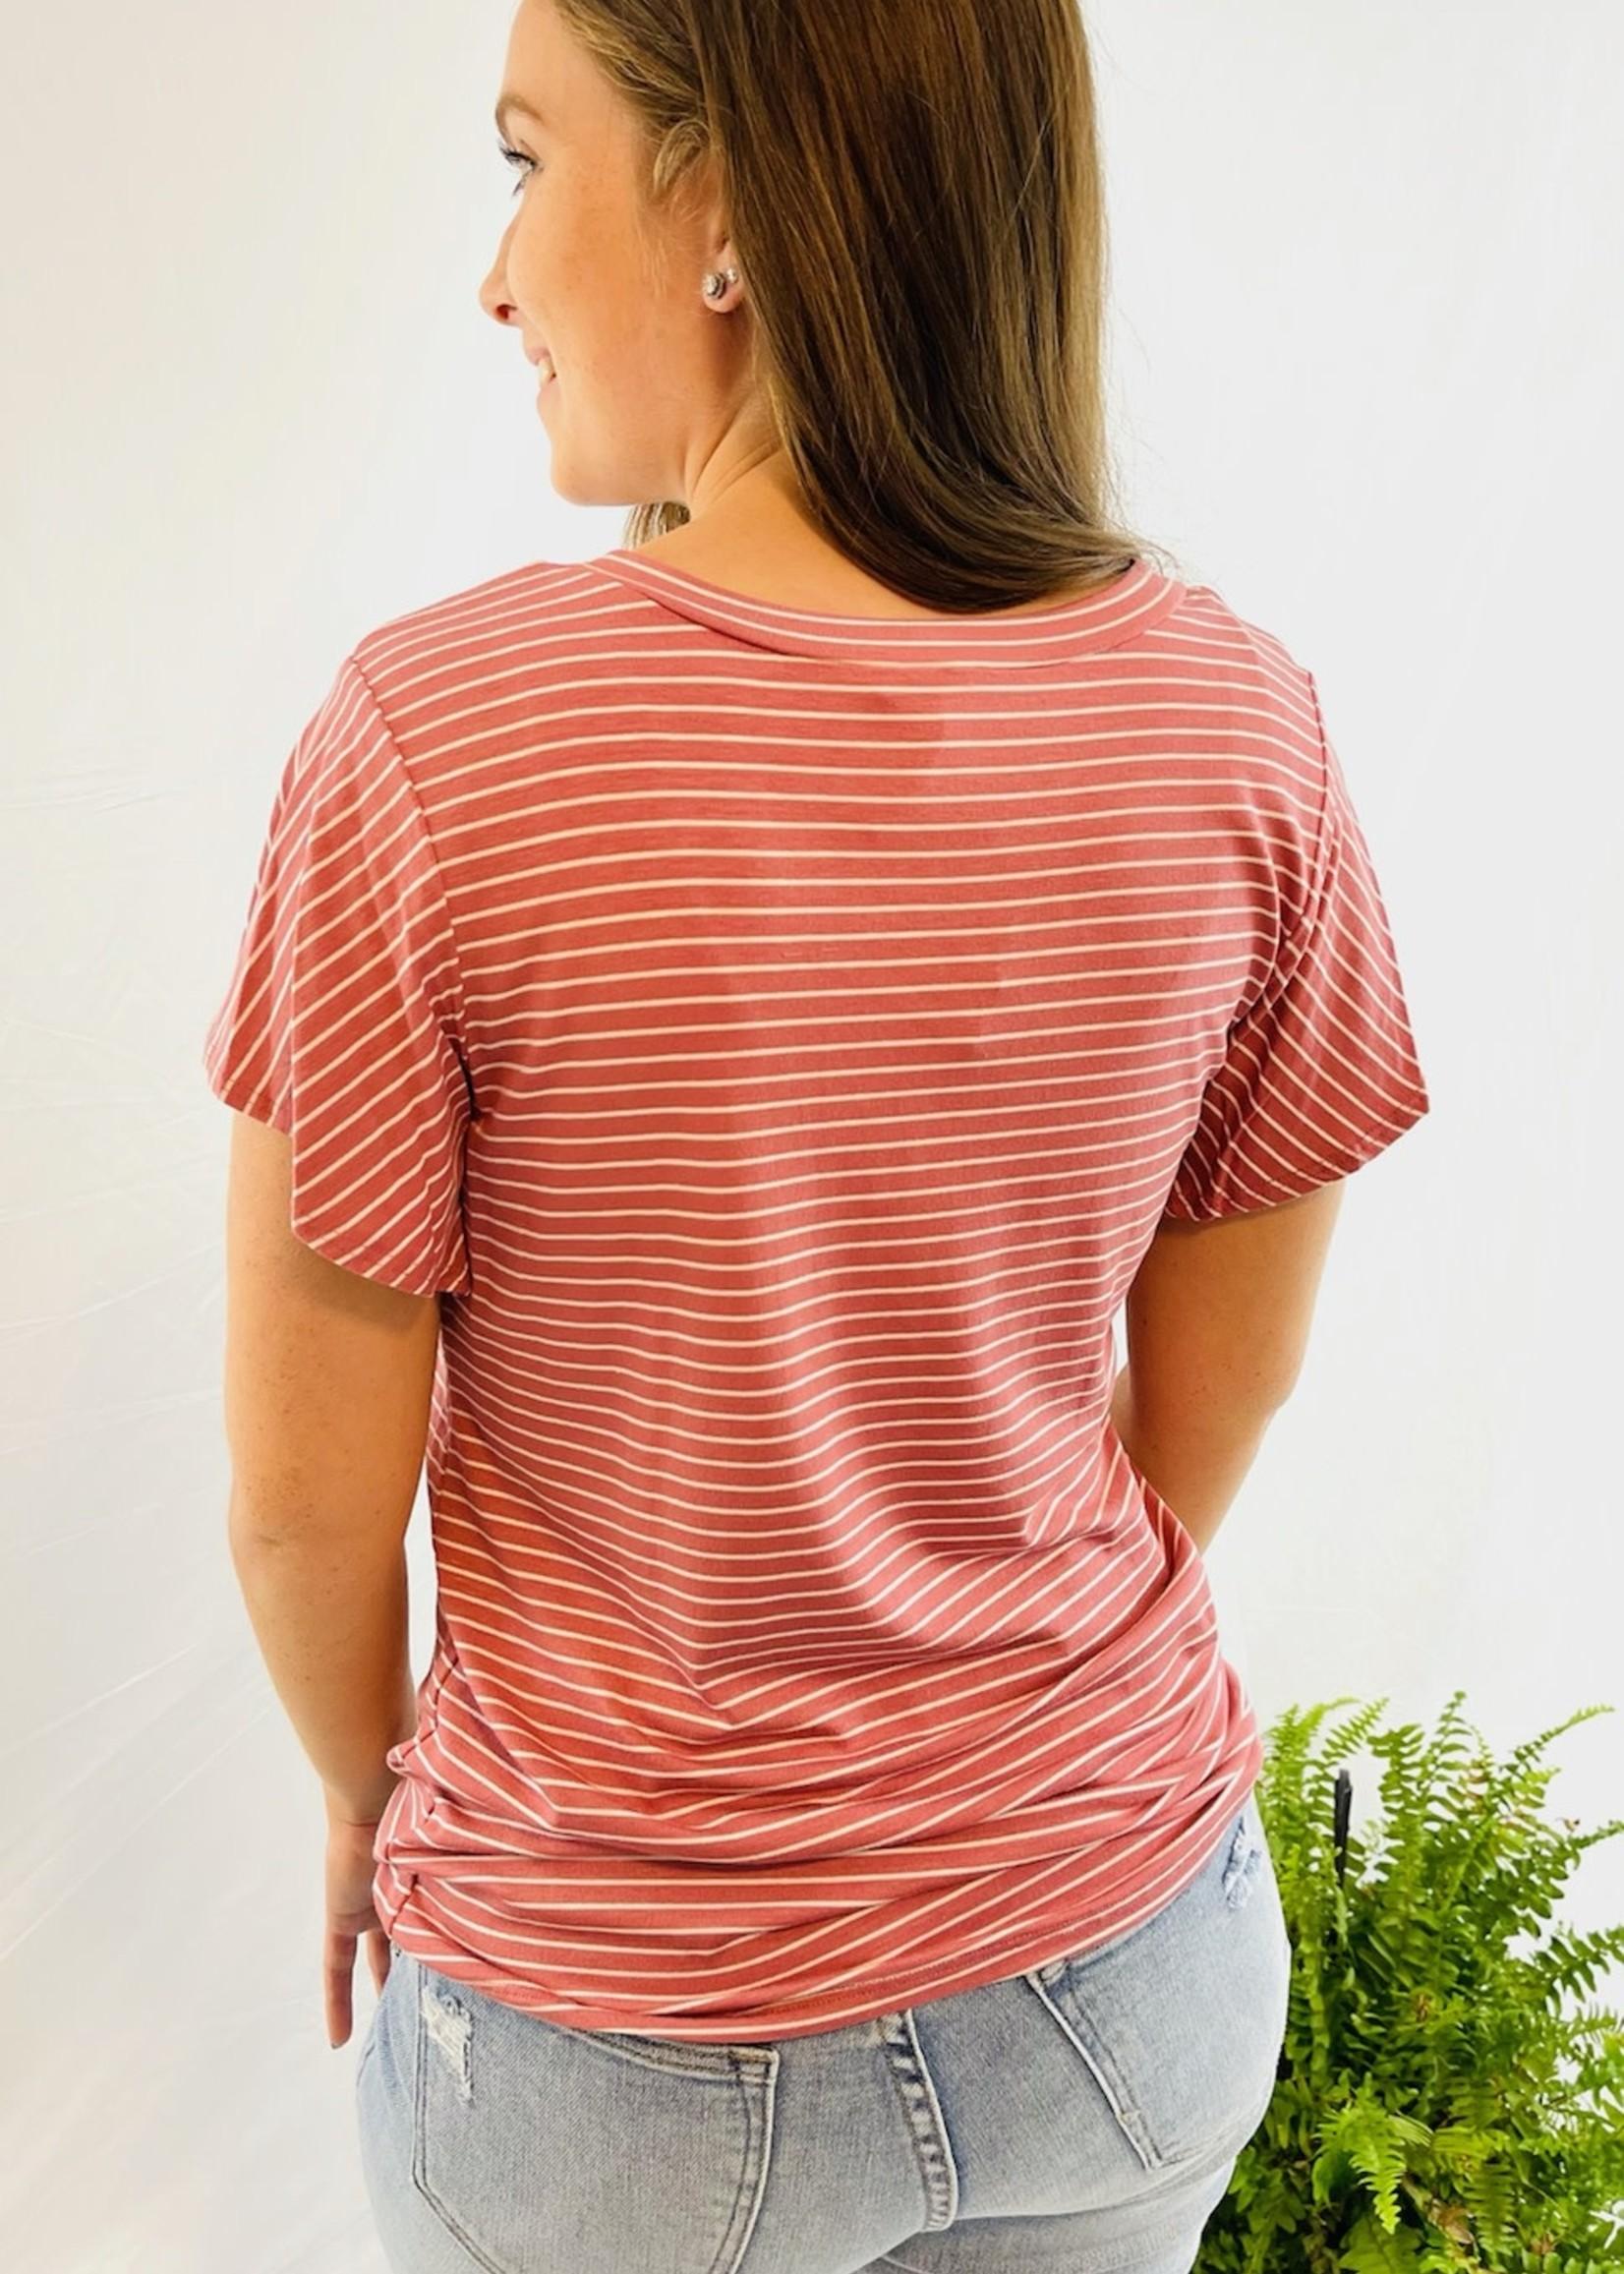 Striped Flutter Sleeve Top